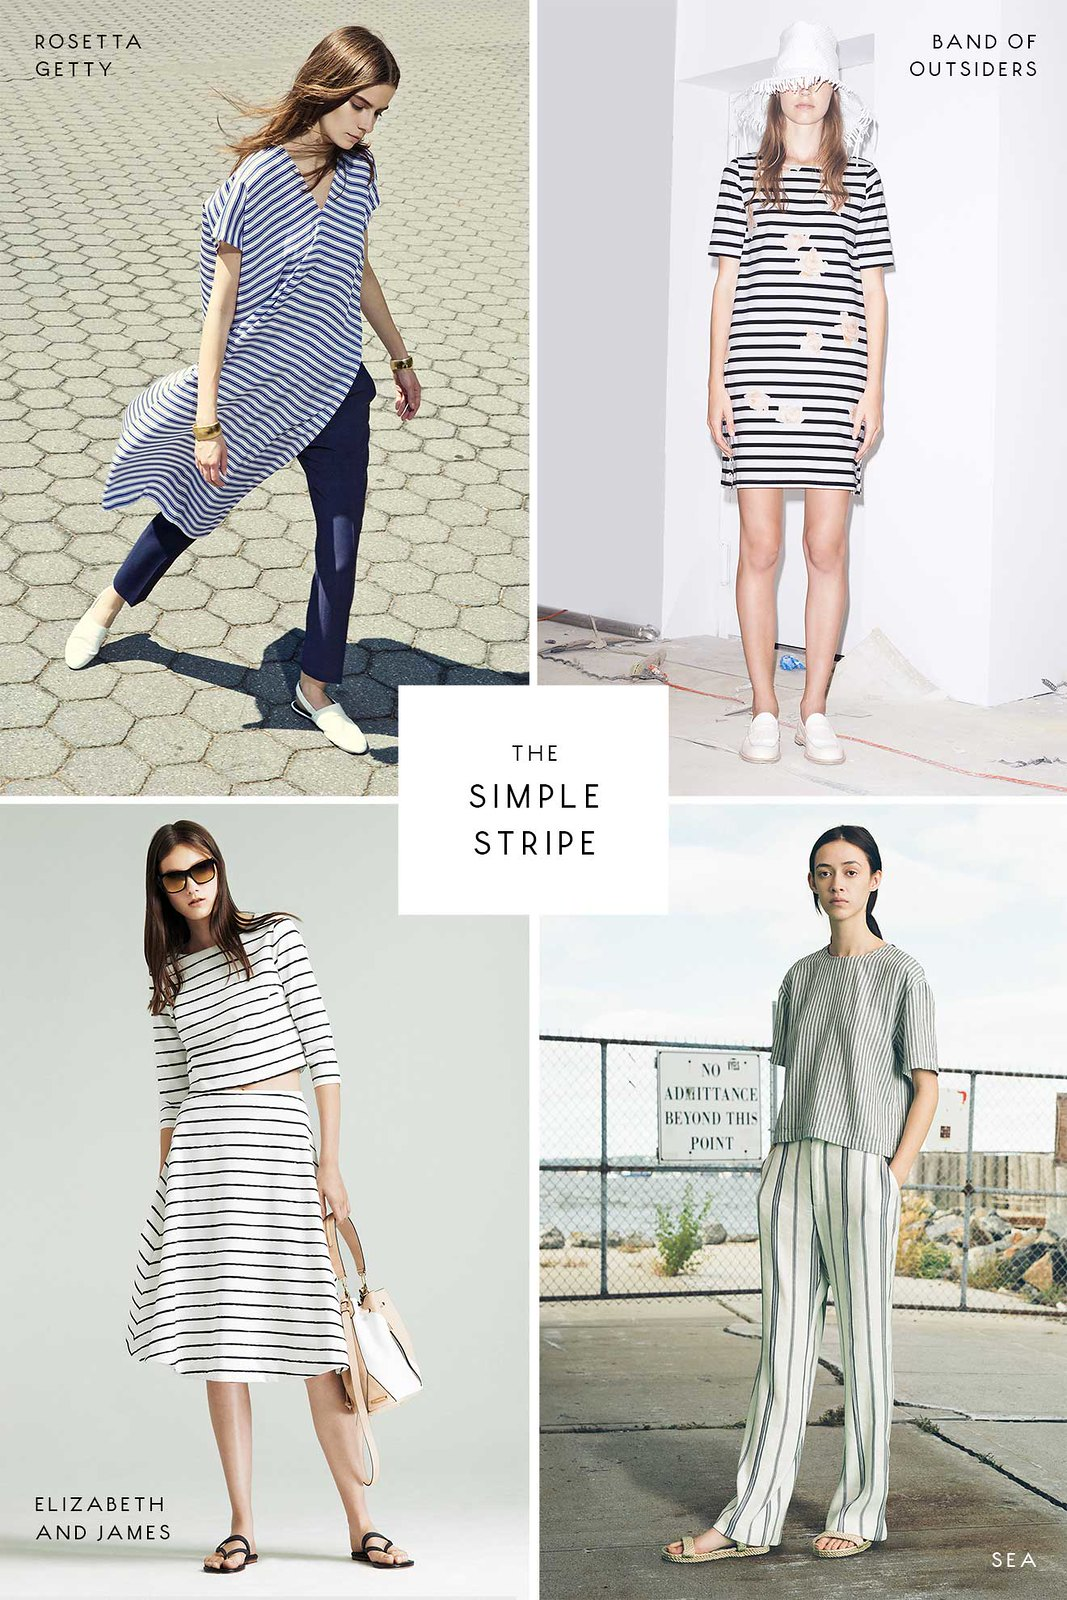 miss-moss-ss15-simple-stripe